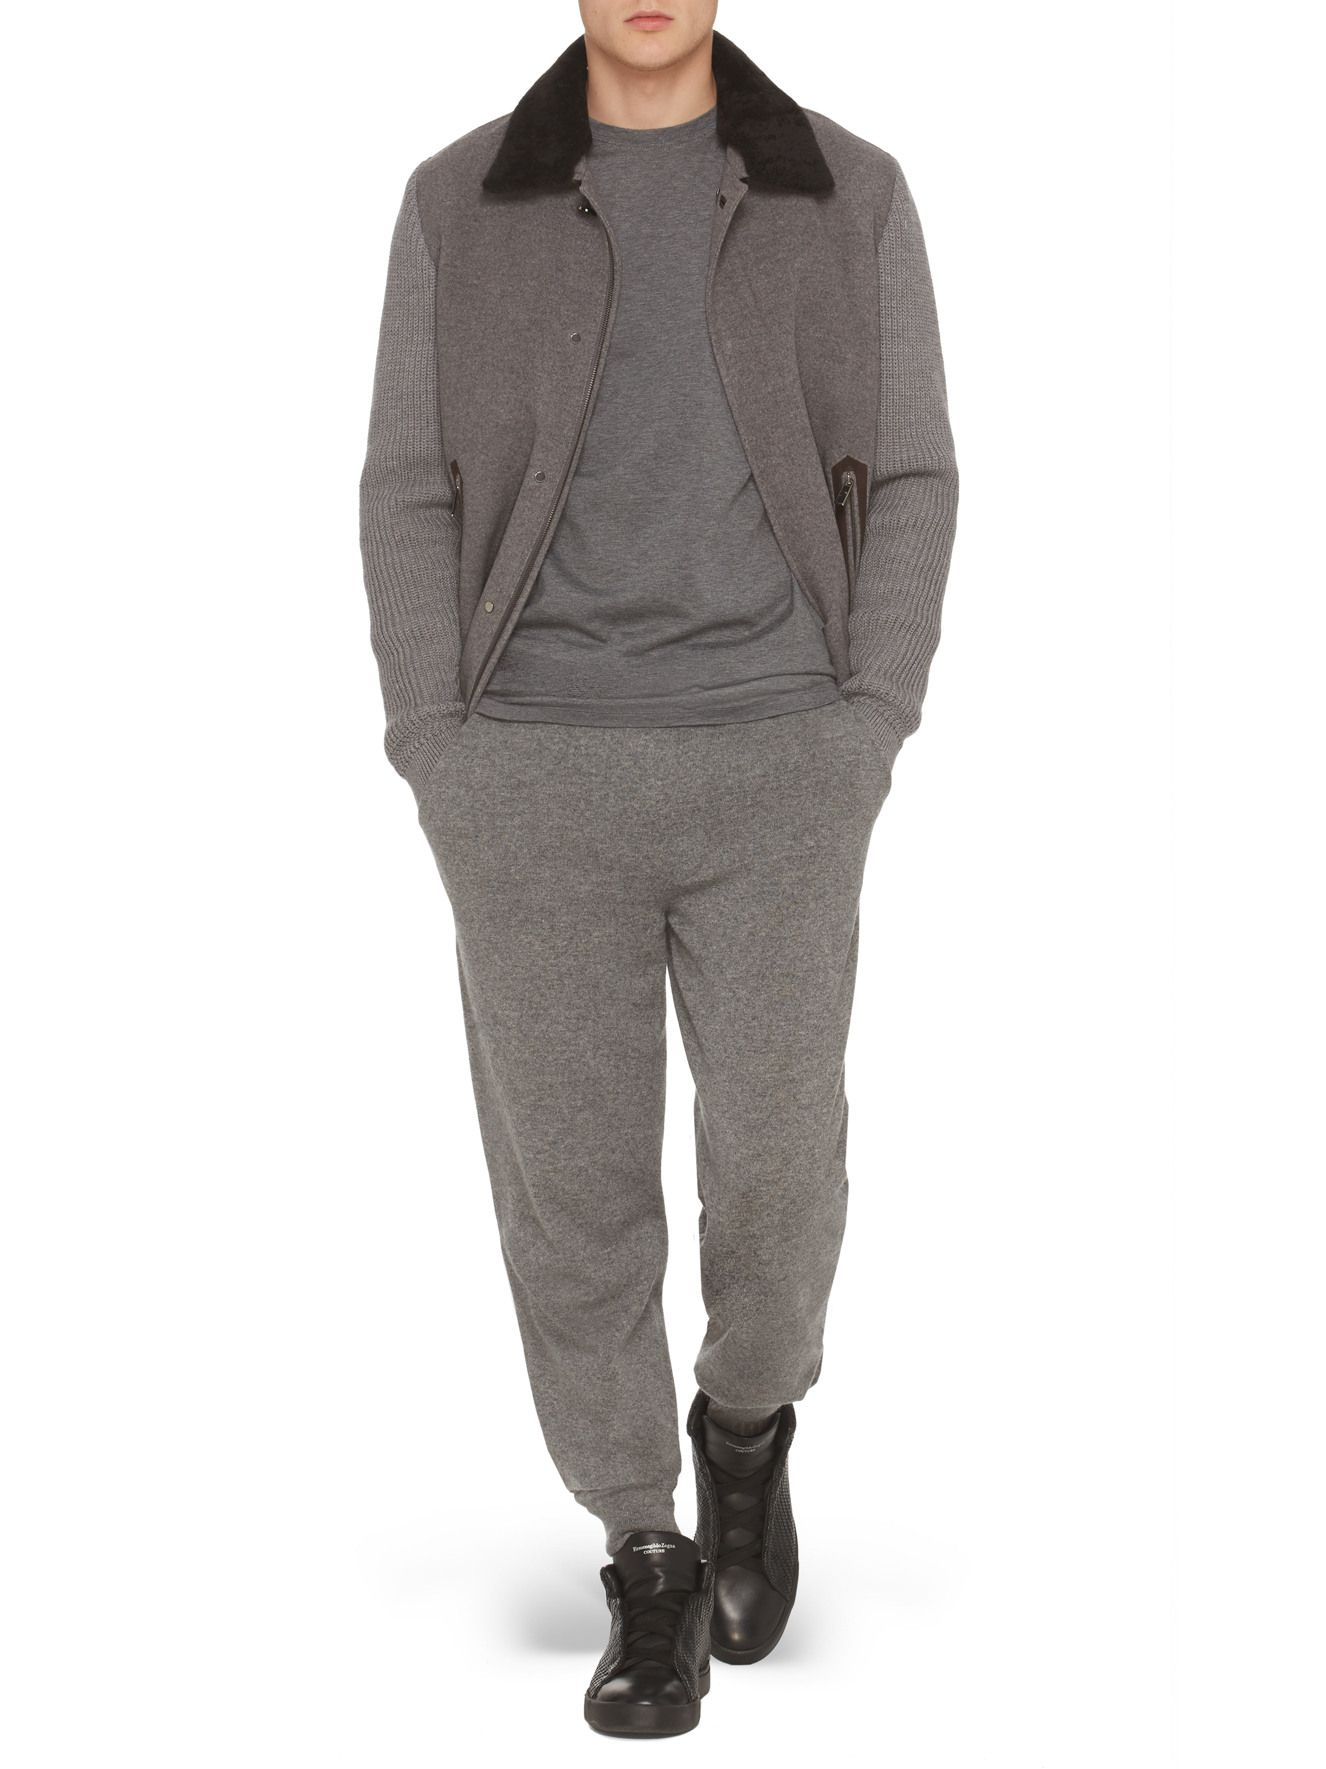 Grey Pure Cashmere Short Jacket FW17 9964697 Zegna